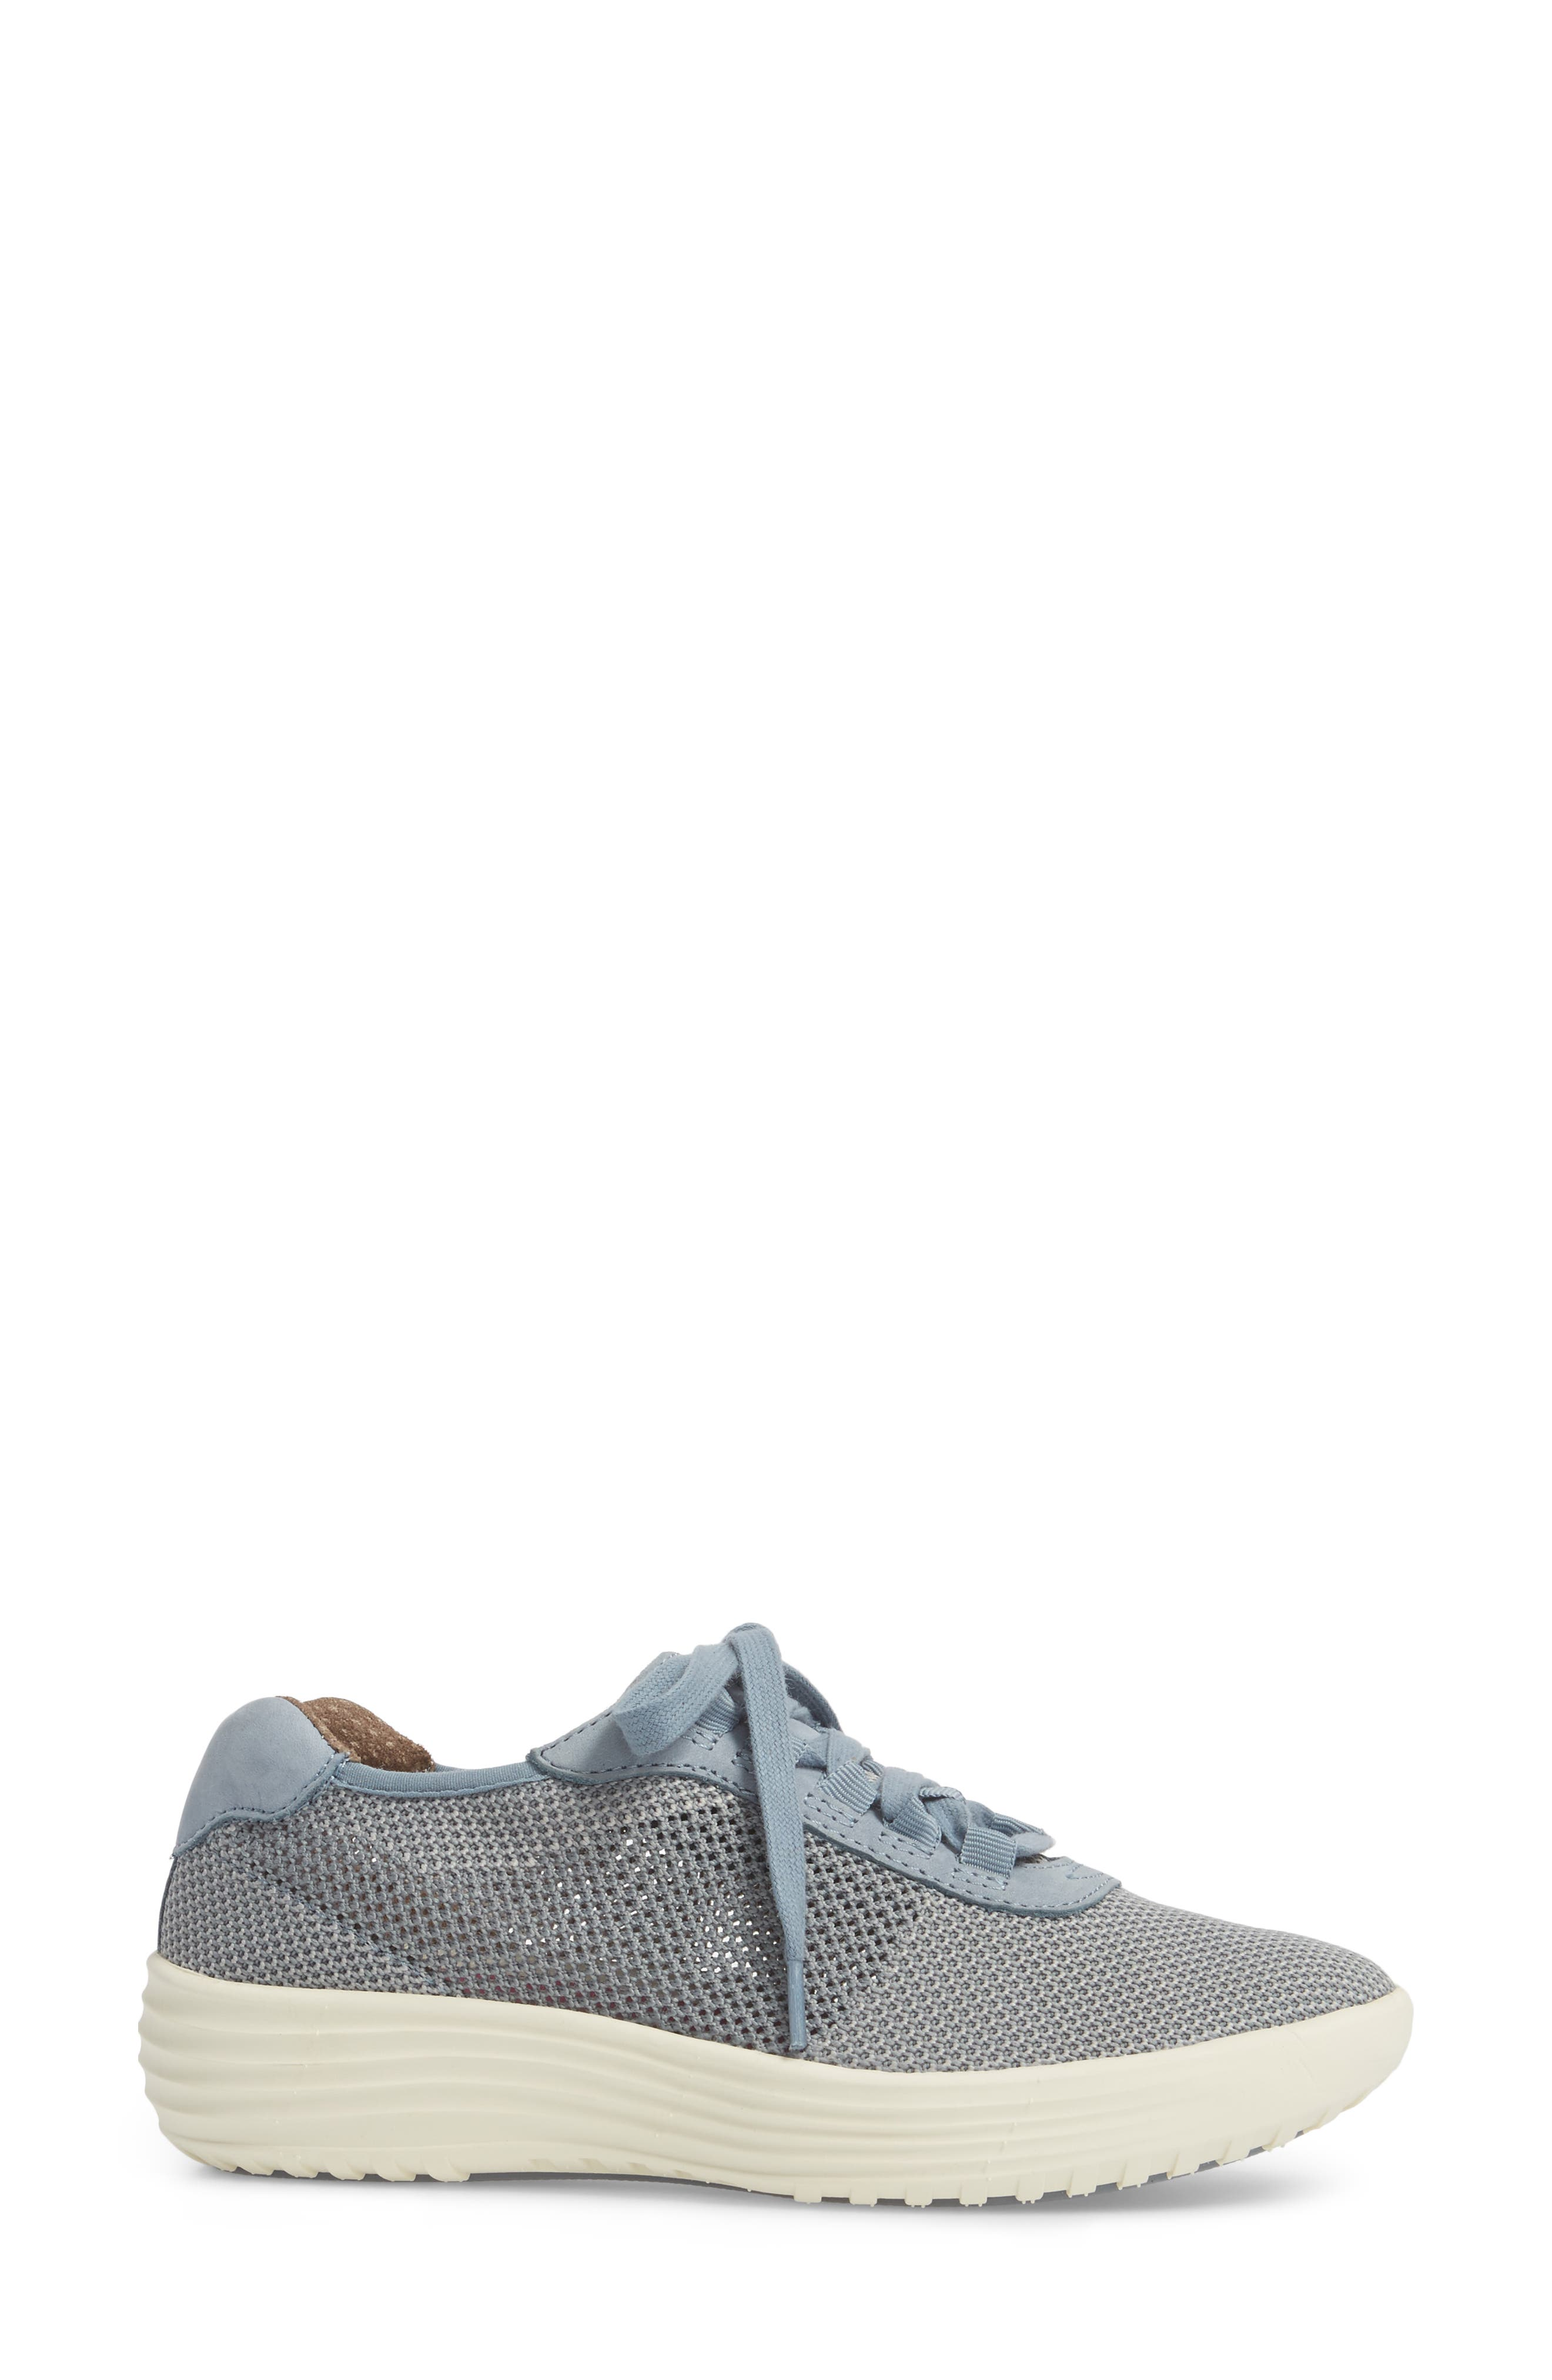 Malibu Sneaker,                             Alternate thumbnail 3, color,                             Chambray Grey Knit Fabric